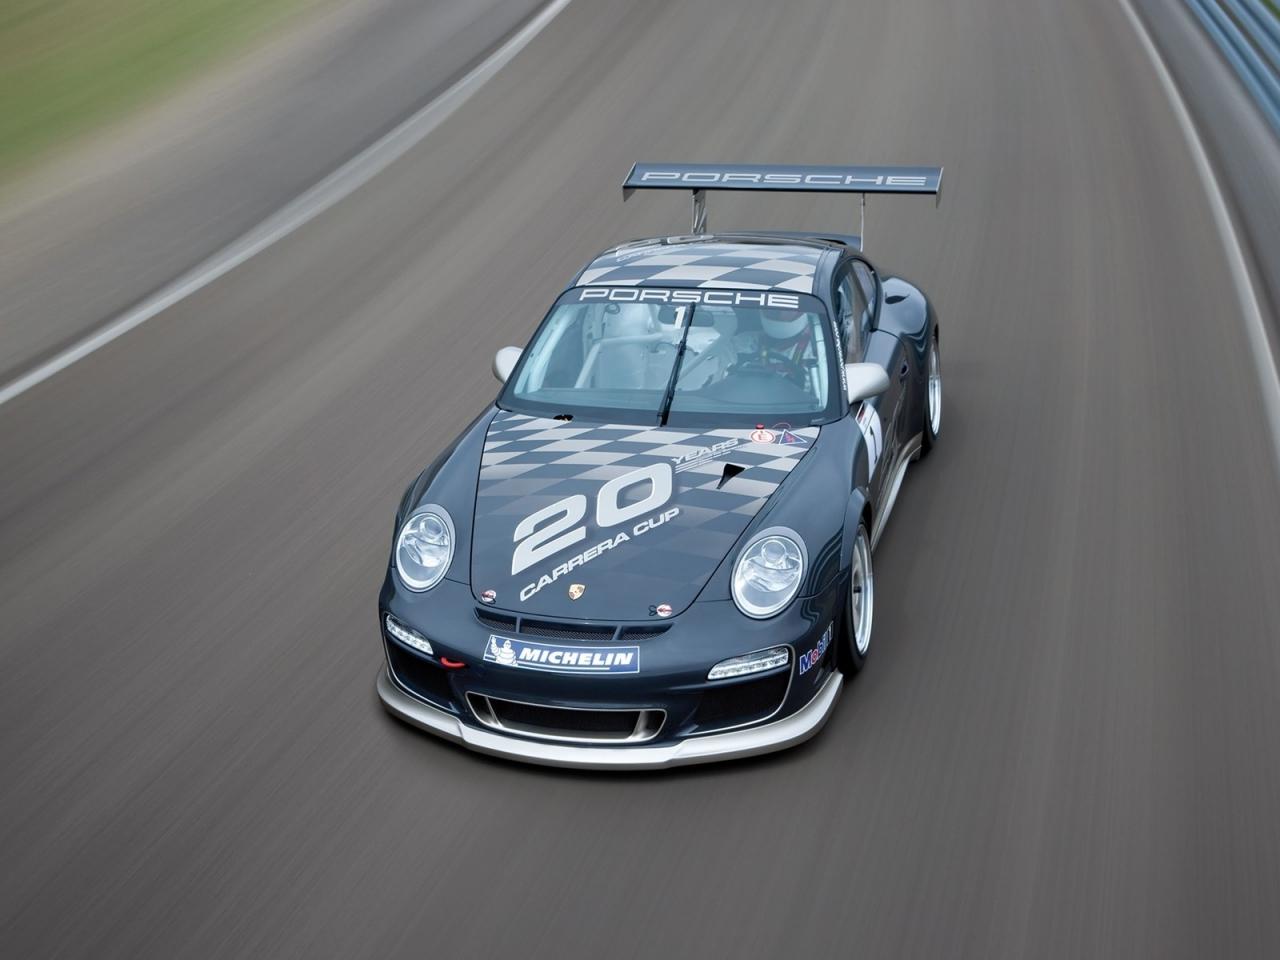 Auto Porsche negro - 1280x960